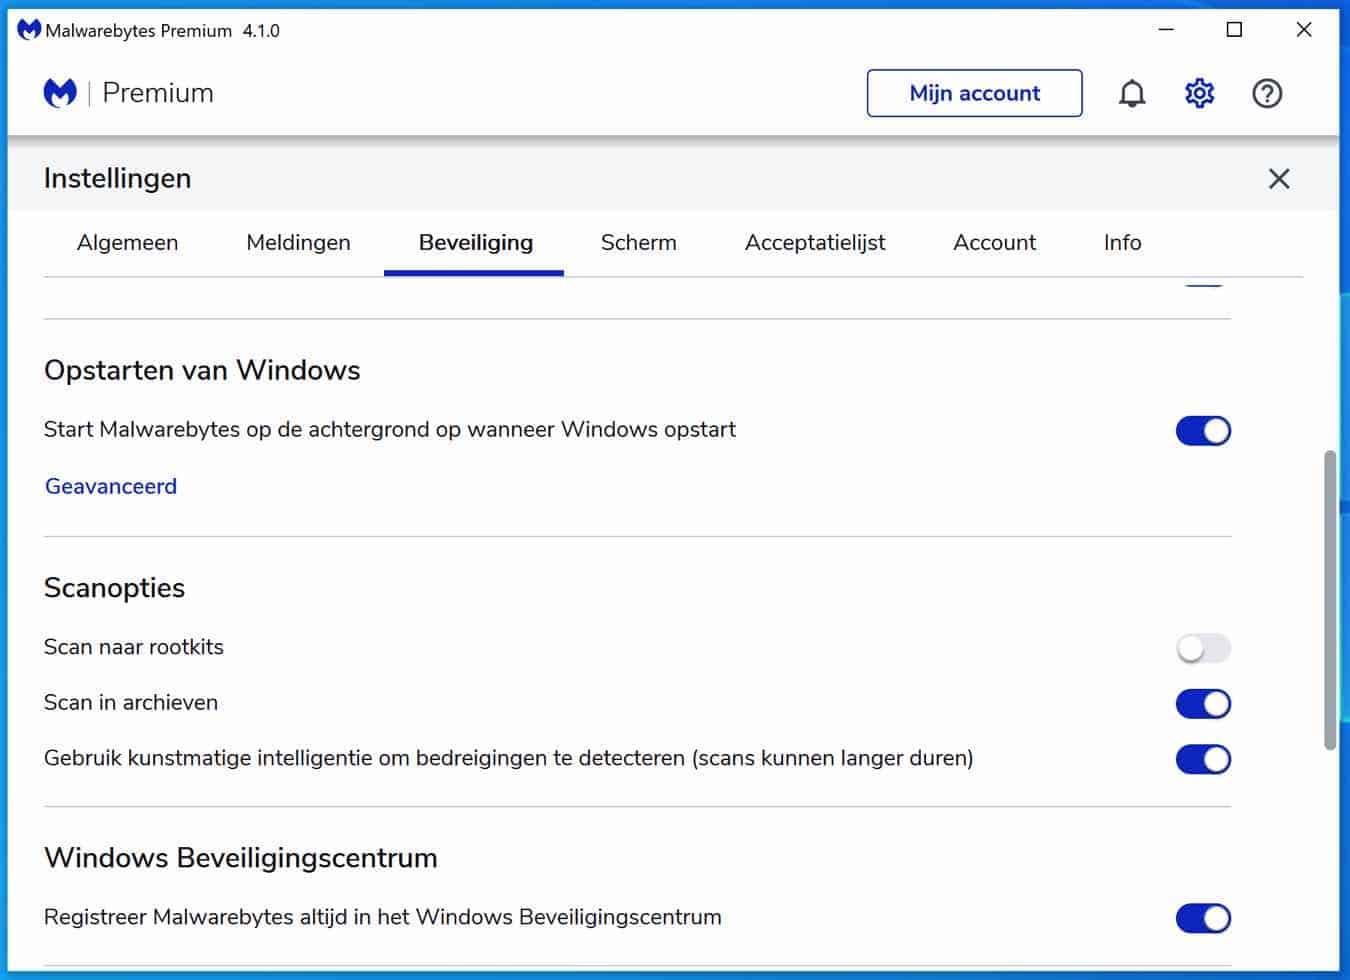 malwarebytes scannen naar rootkits